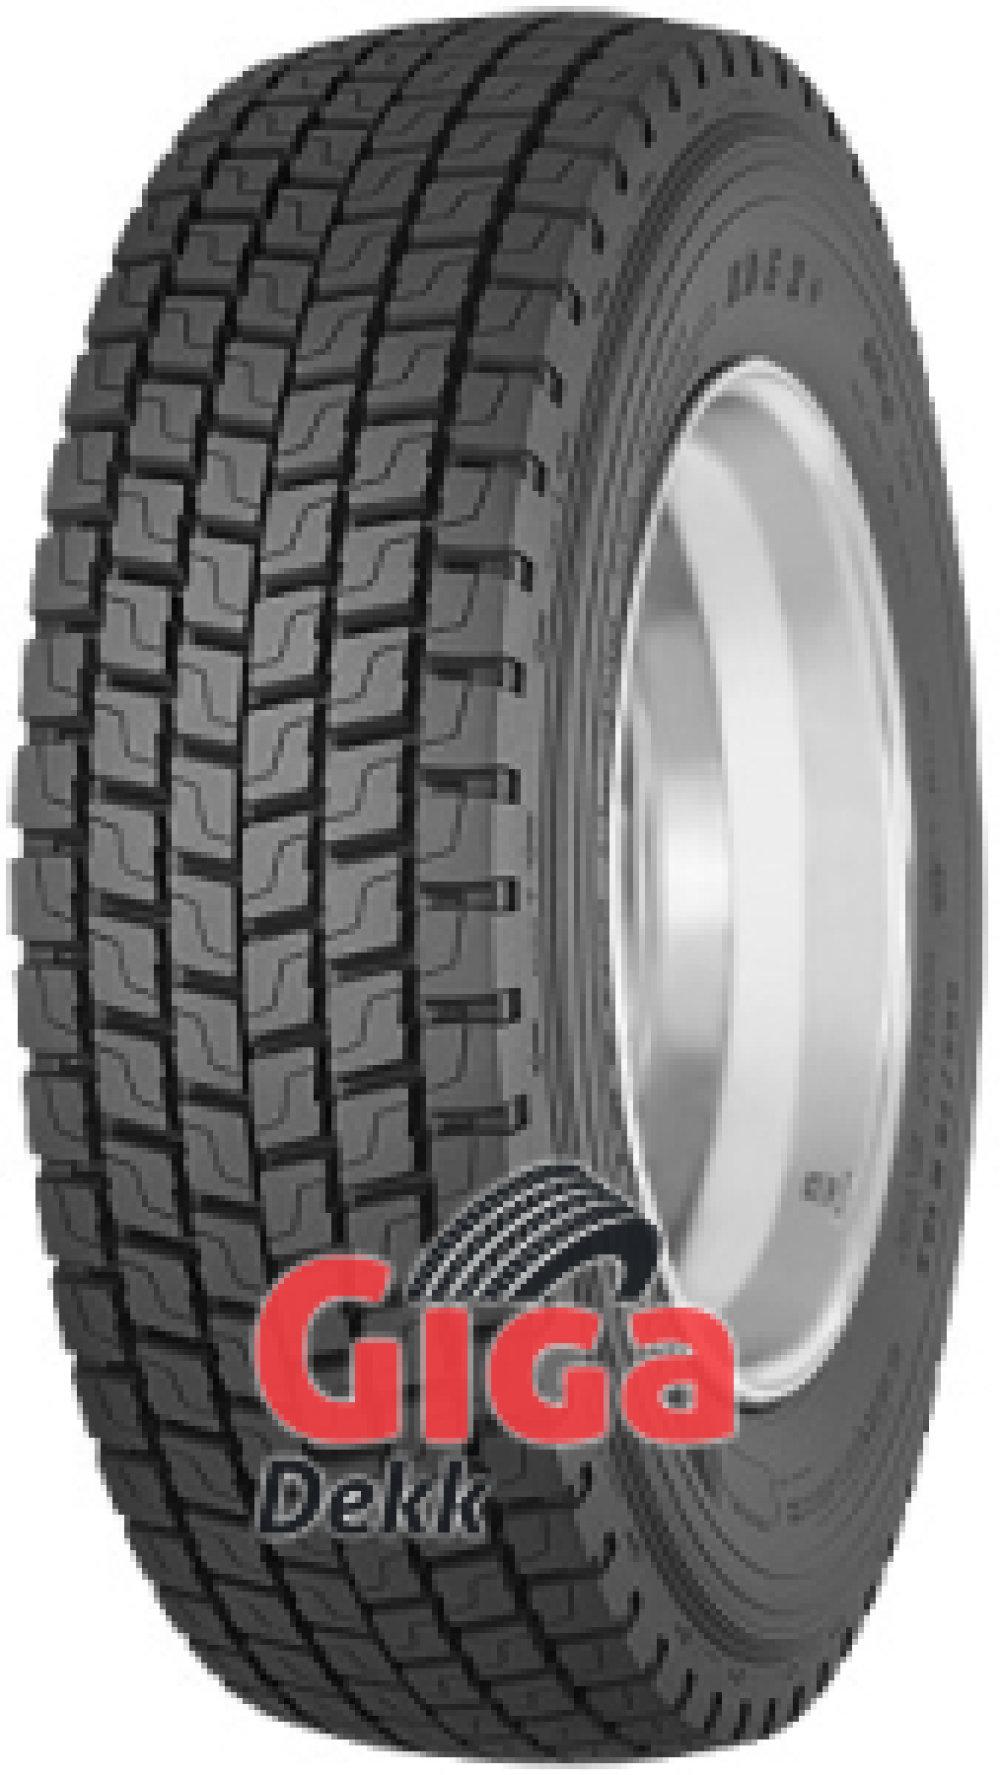 Michelin Remix XDE 2 ( 205/75 R17.5 124/122M regummiert )